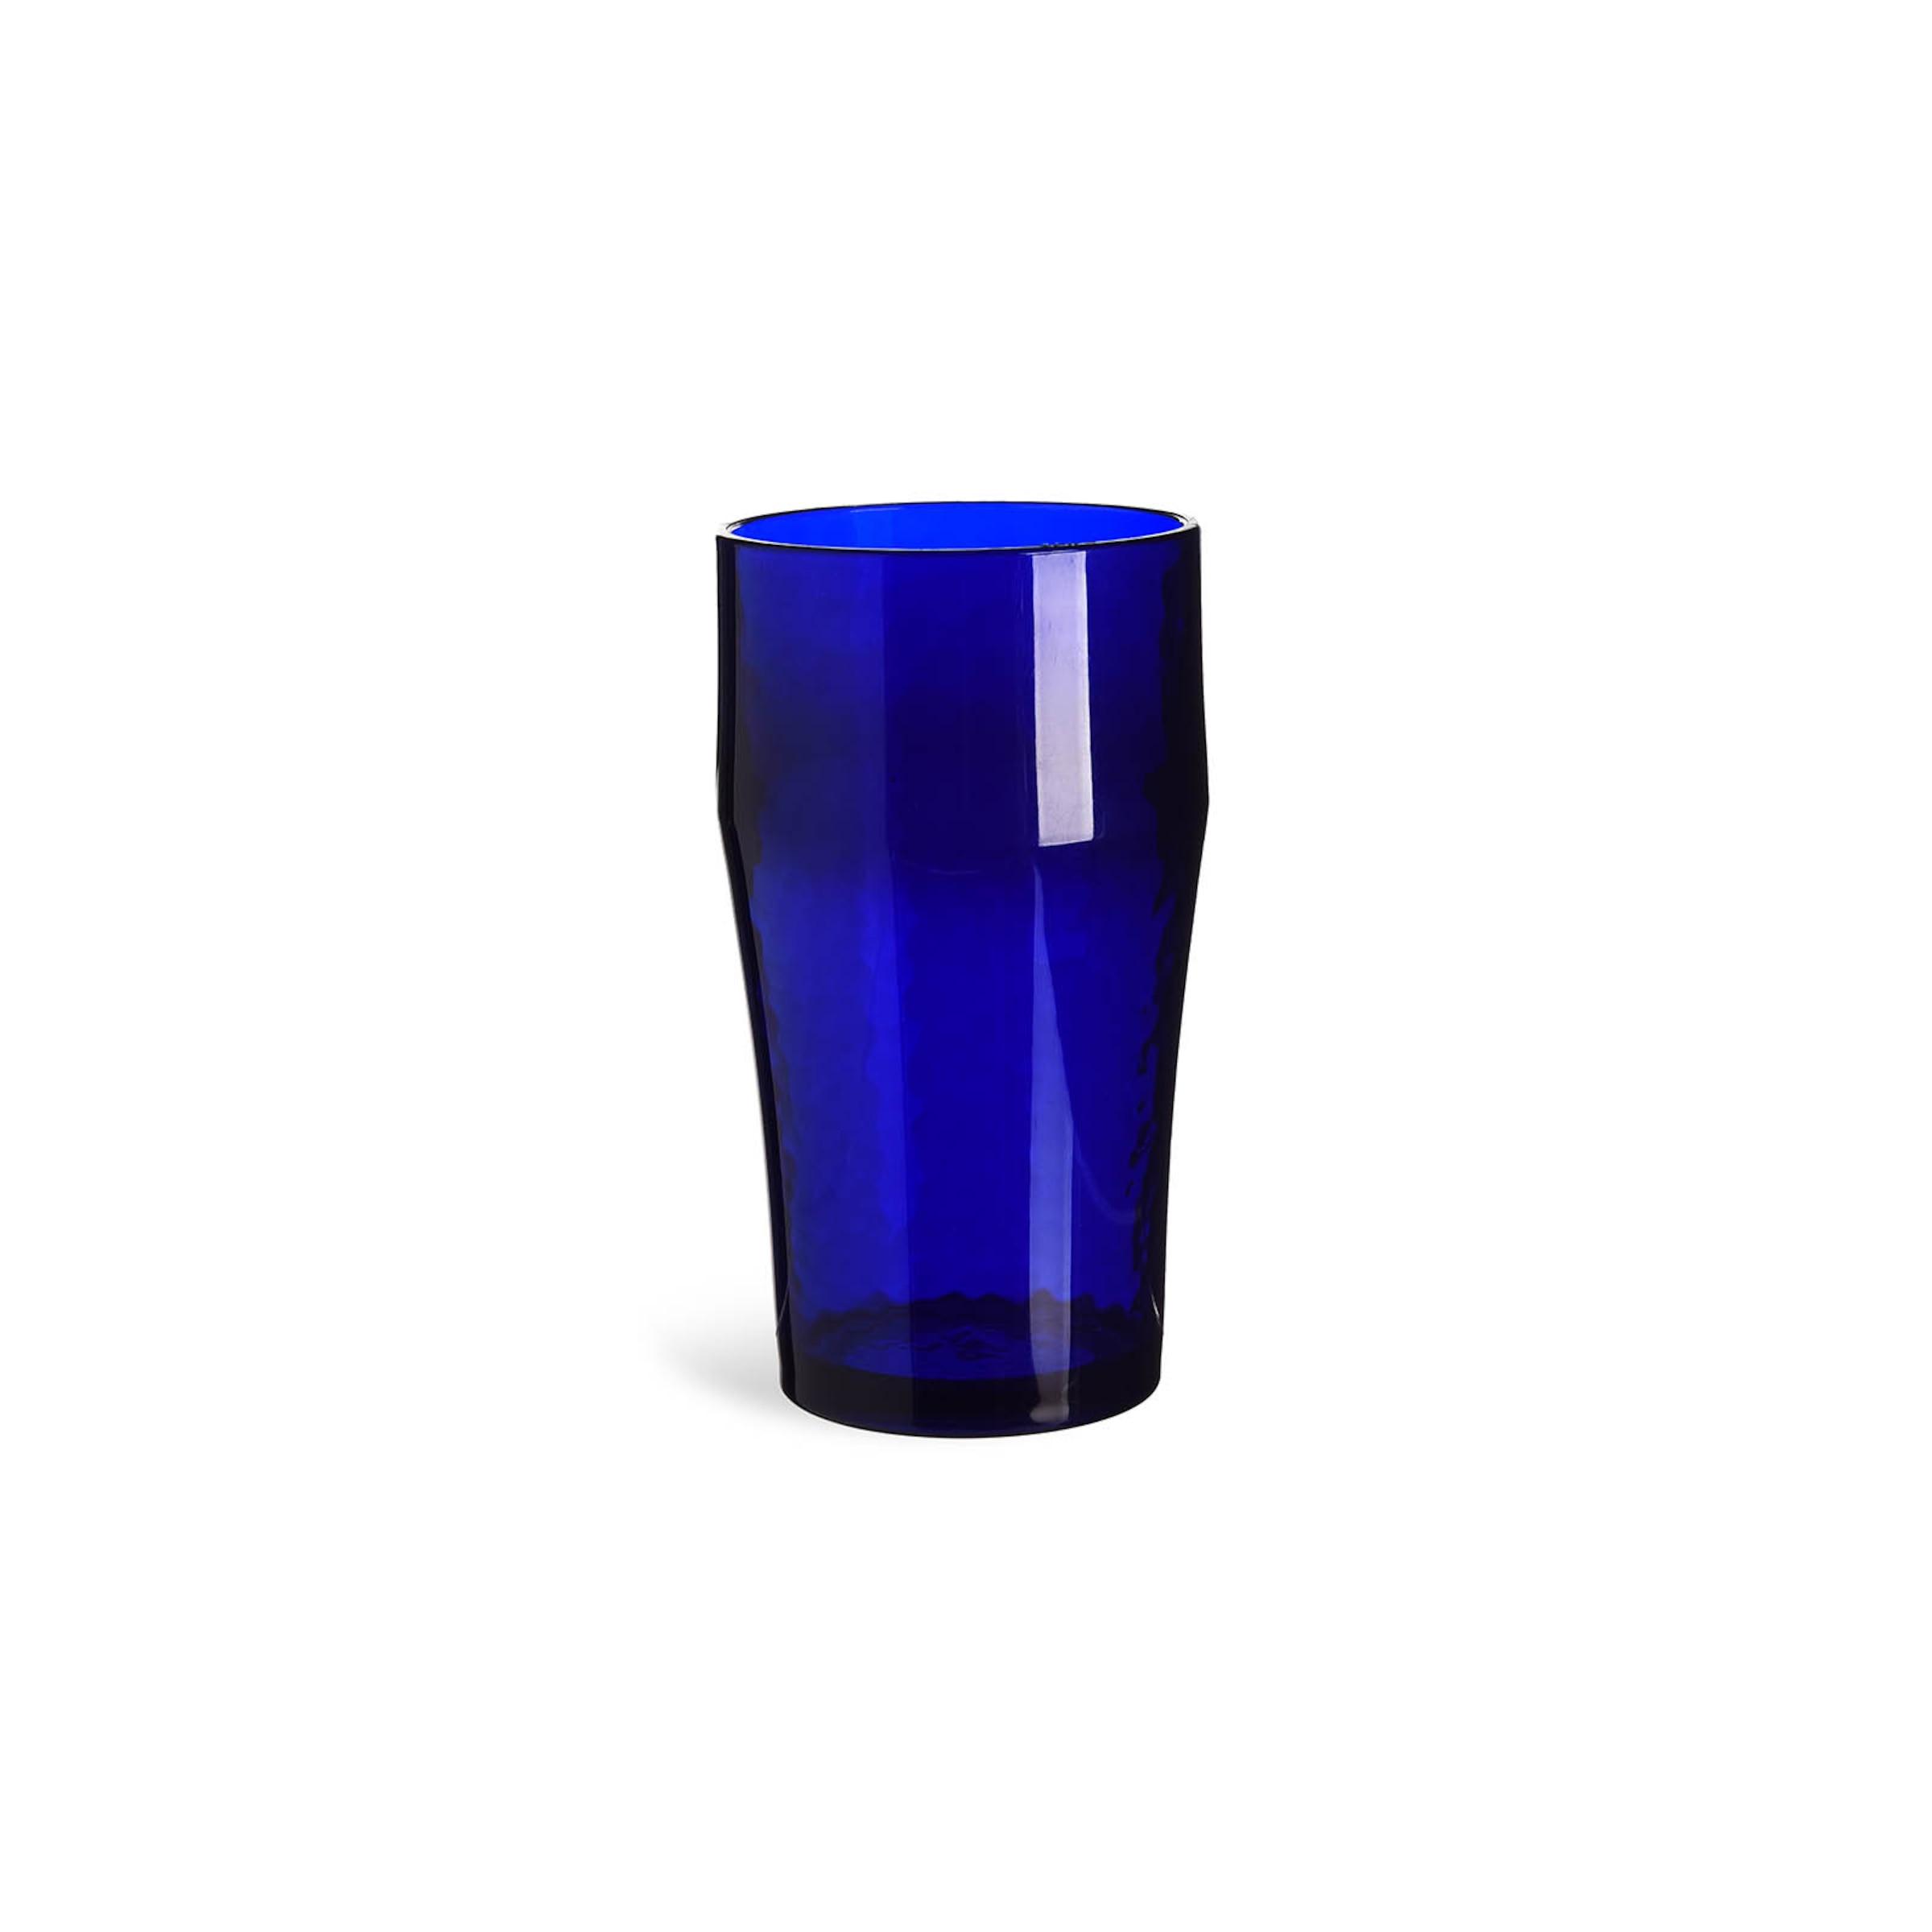 Picknick-Becher, 550ml, dunkel-blau